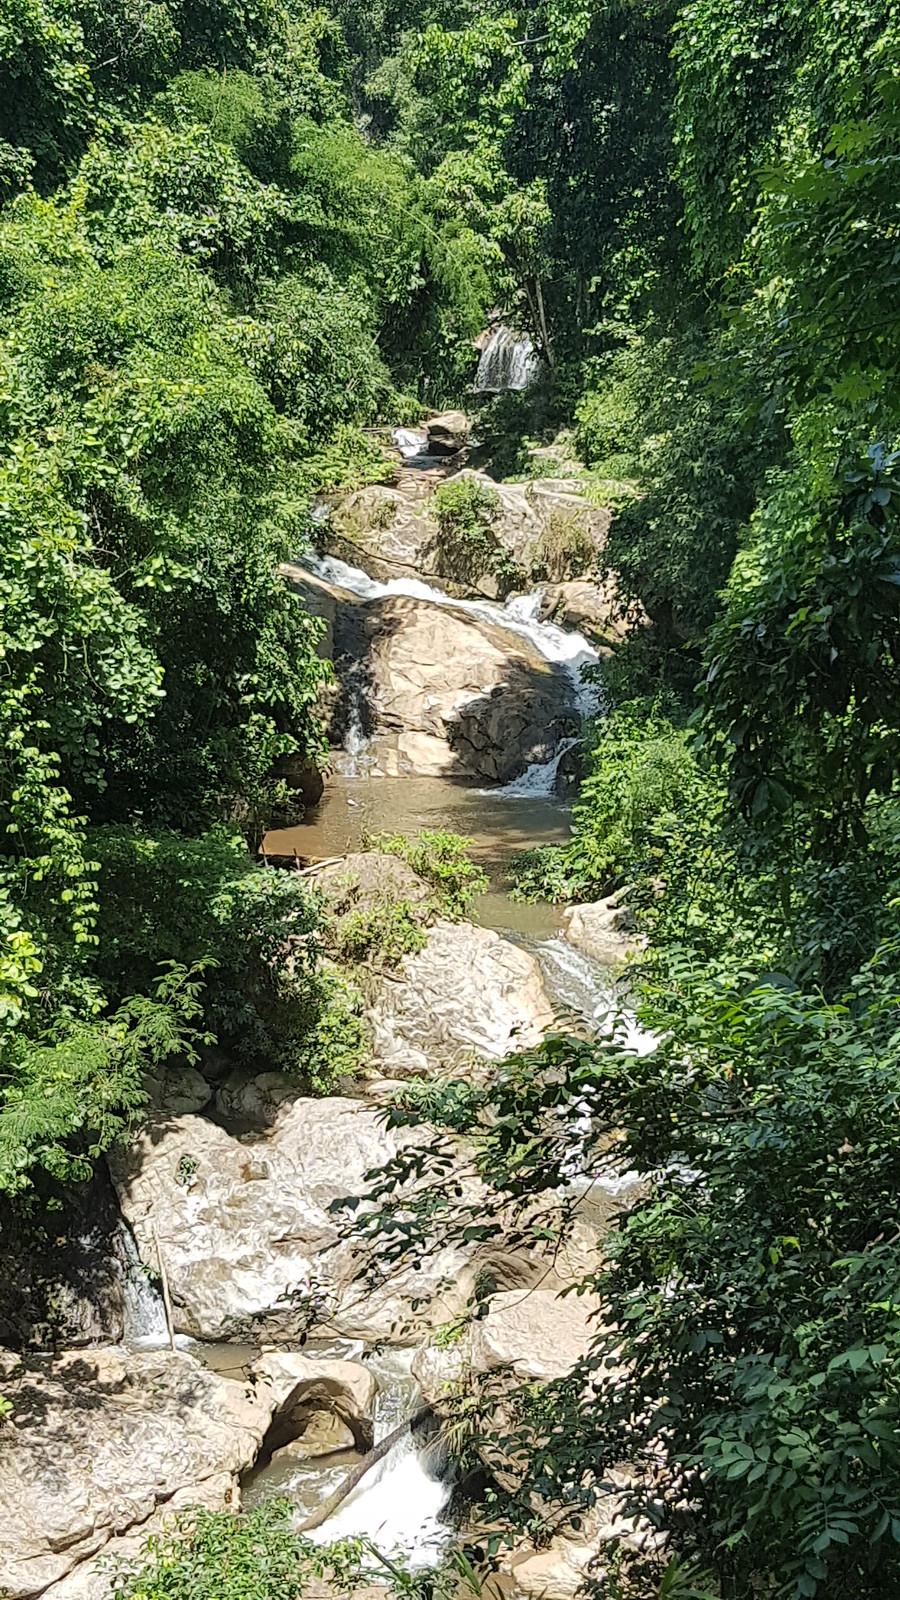 Hiking along Mae Sa waterfall. The nature.